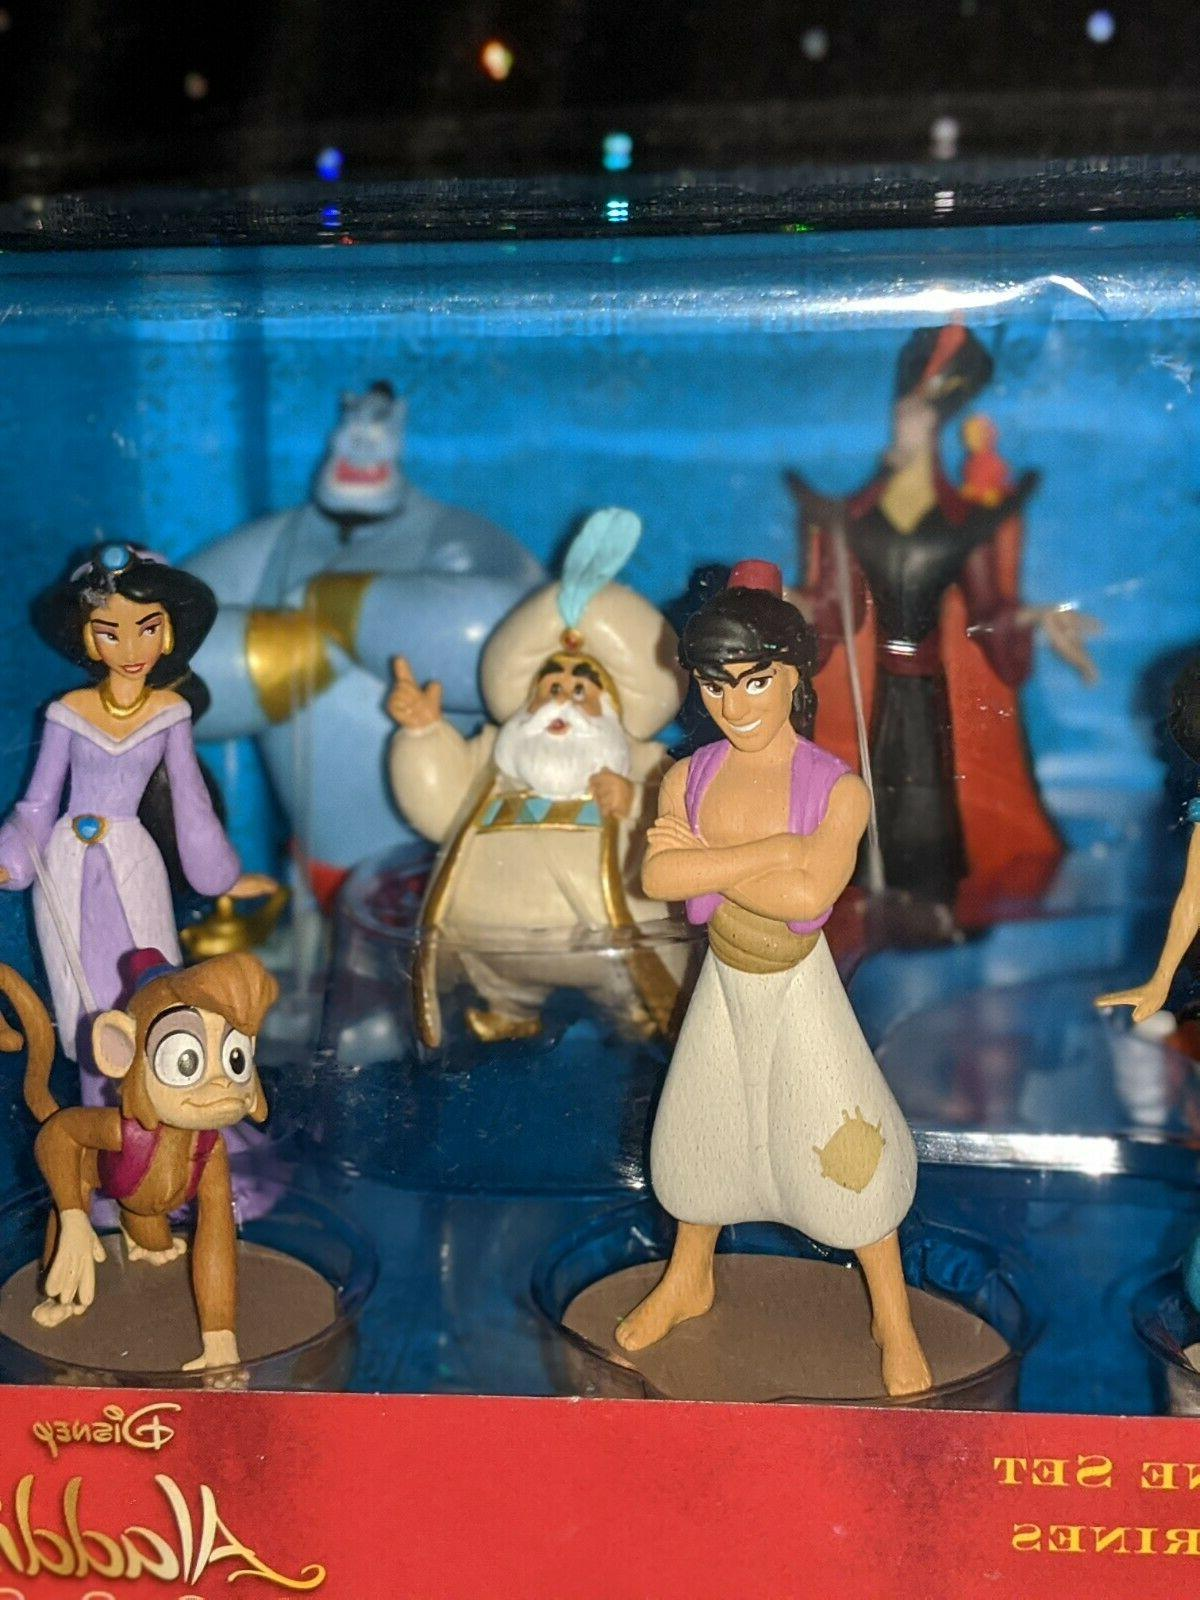 Disney, Aladdin, 9 Deluxe Figurine Playset/Giftset, Jasmine, Genie, Jafar